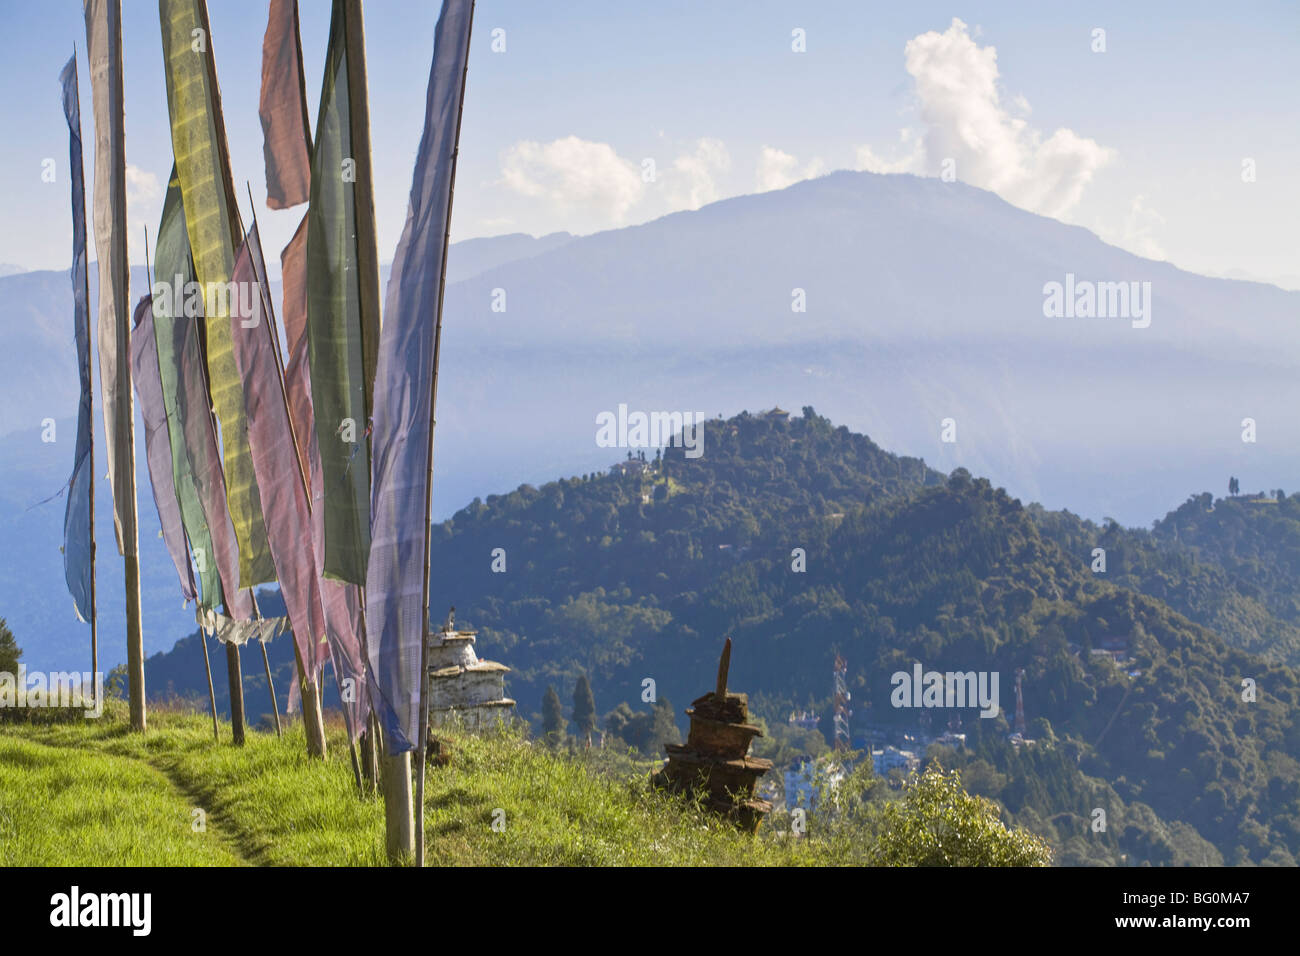 Sangachoeling Gompa Gompa, el segundo más antiguo de Sikkim, Pelling, Sikkim, India, Asia Foto de stock